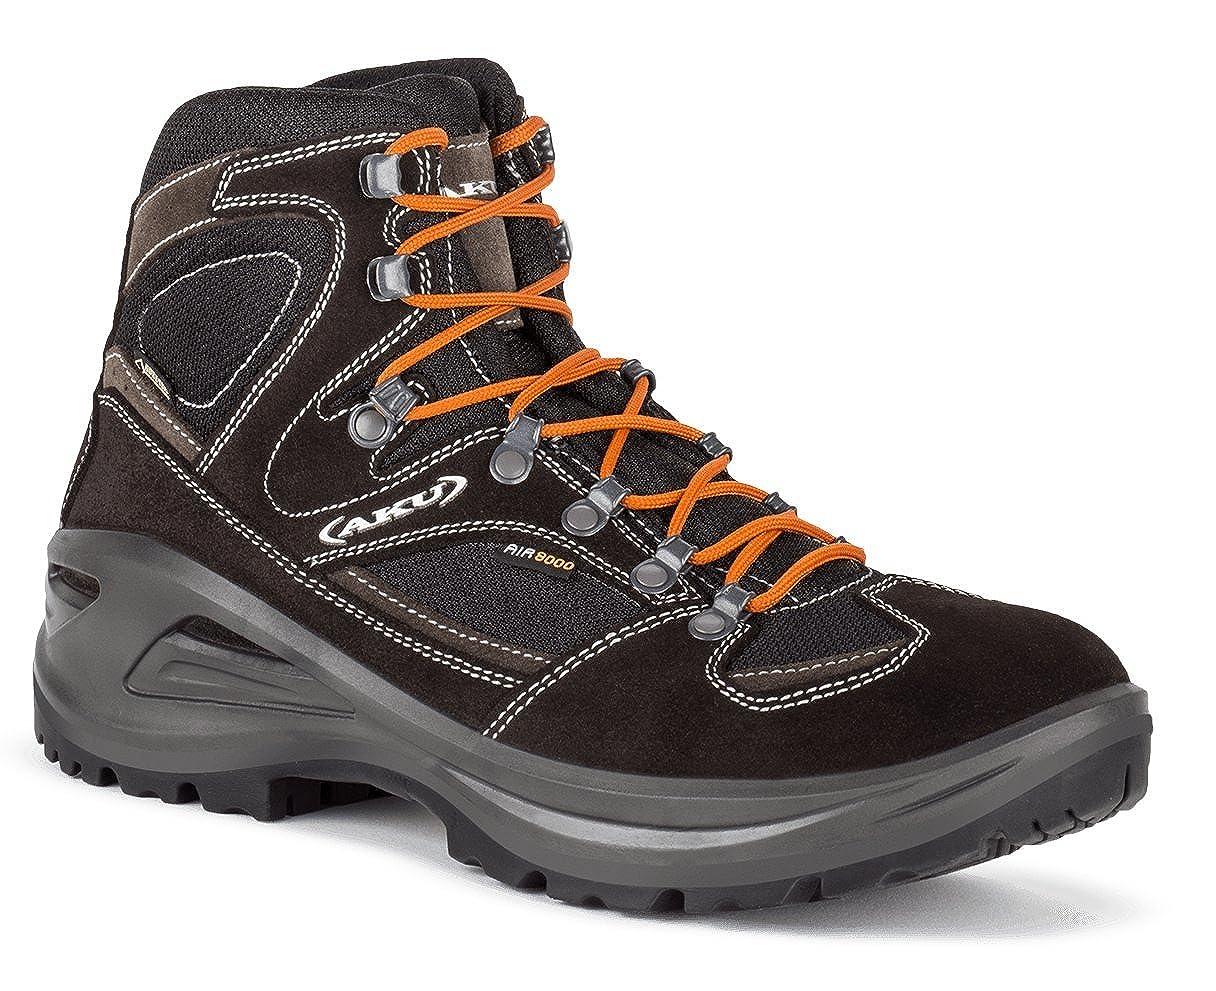 AKU Sendera GTX - Schwarz Orange - - - EU 47 UK 12 US 12.5 - Komfortabler Wasserdichter Gore-Tex® Wanderschuh e1949b